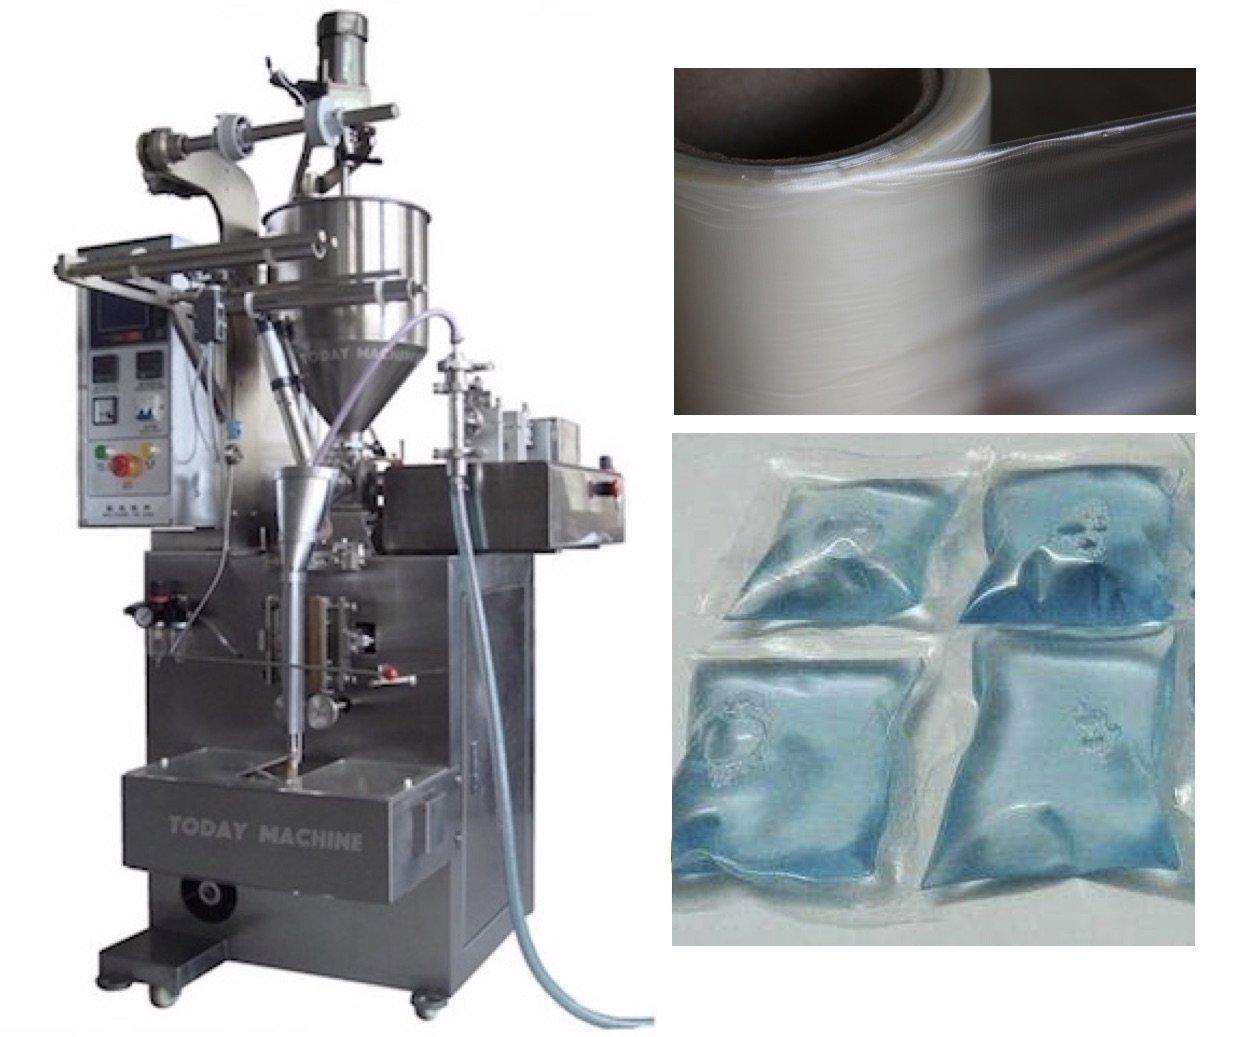 3 - 100 g de agua líquida pura electrónica totalmente automática ...